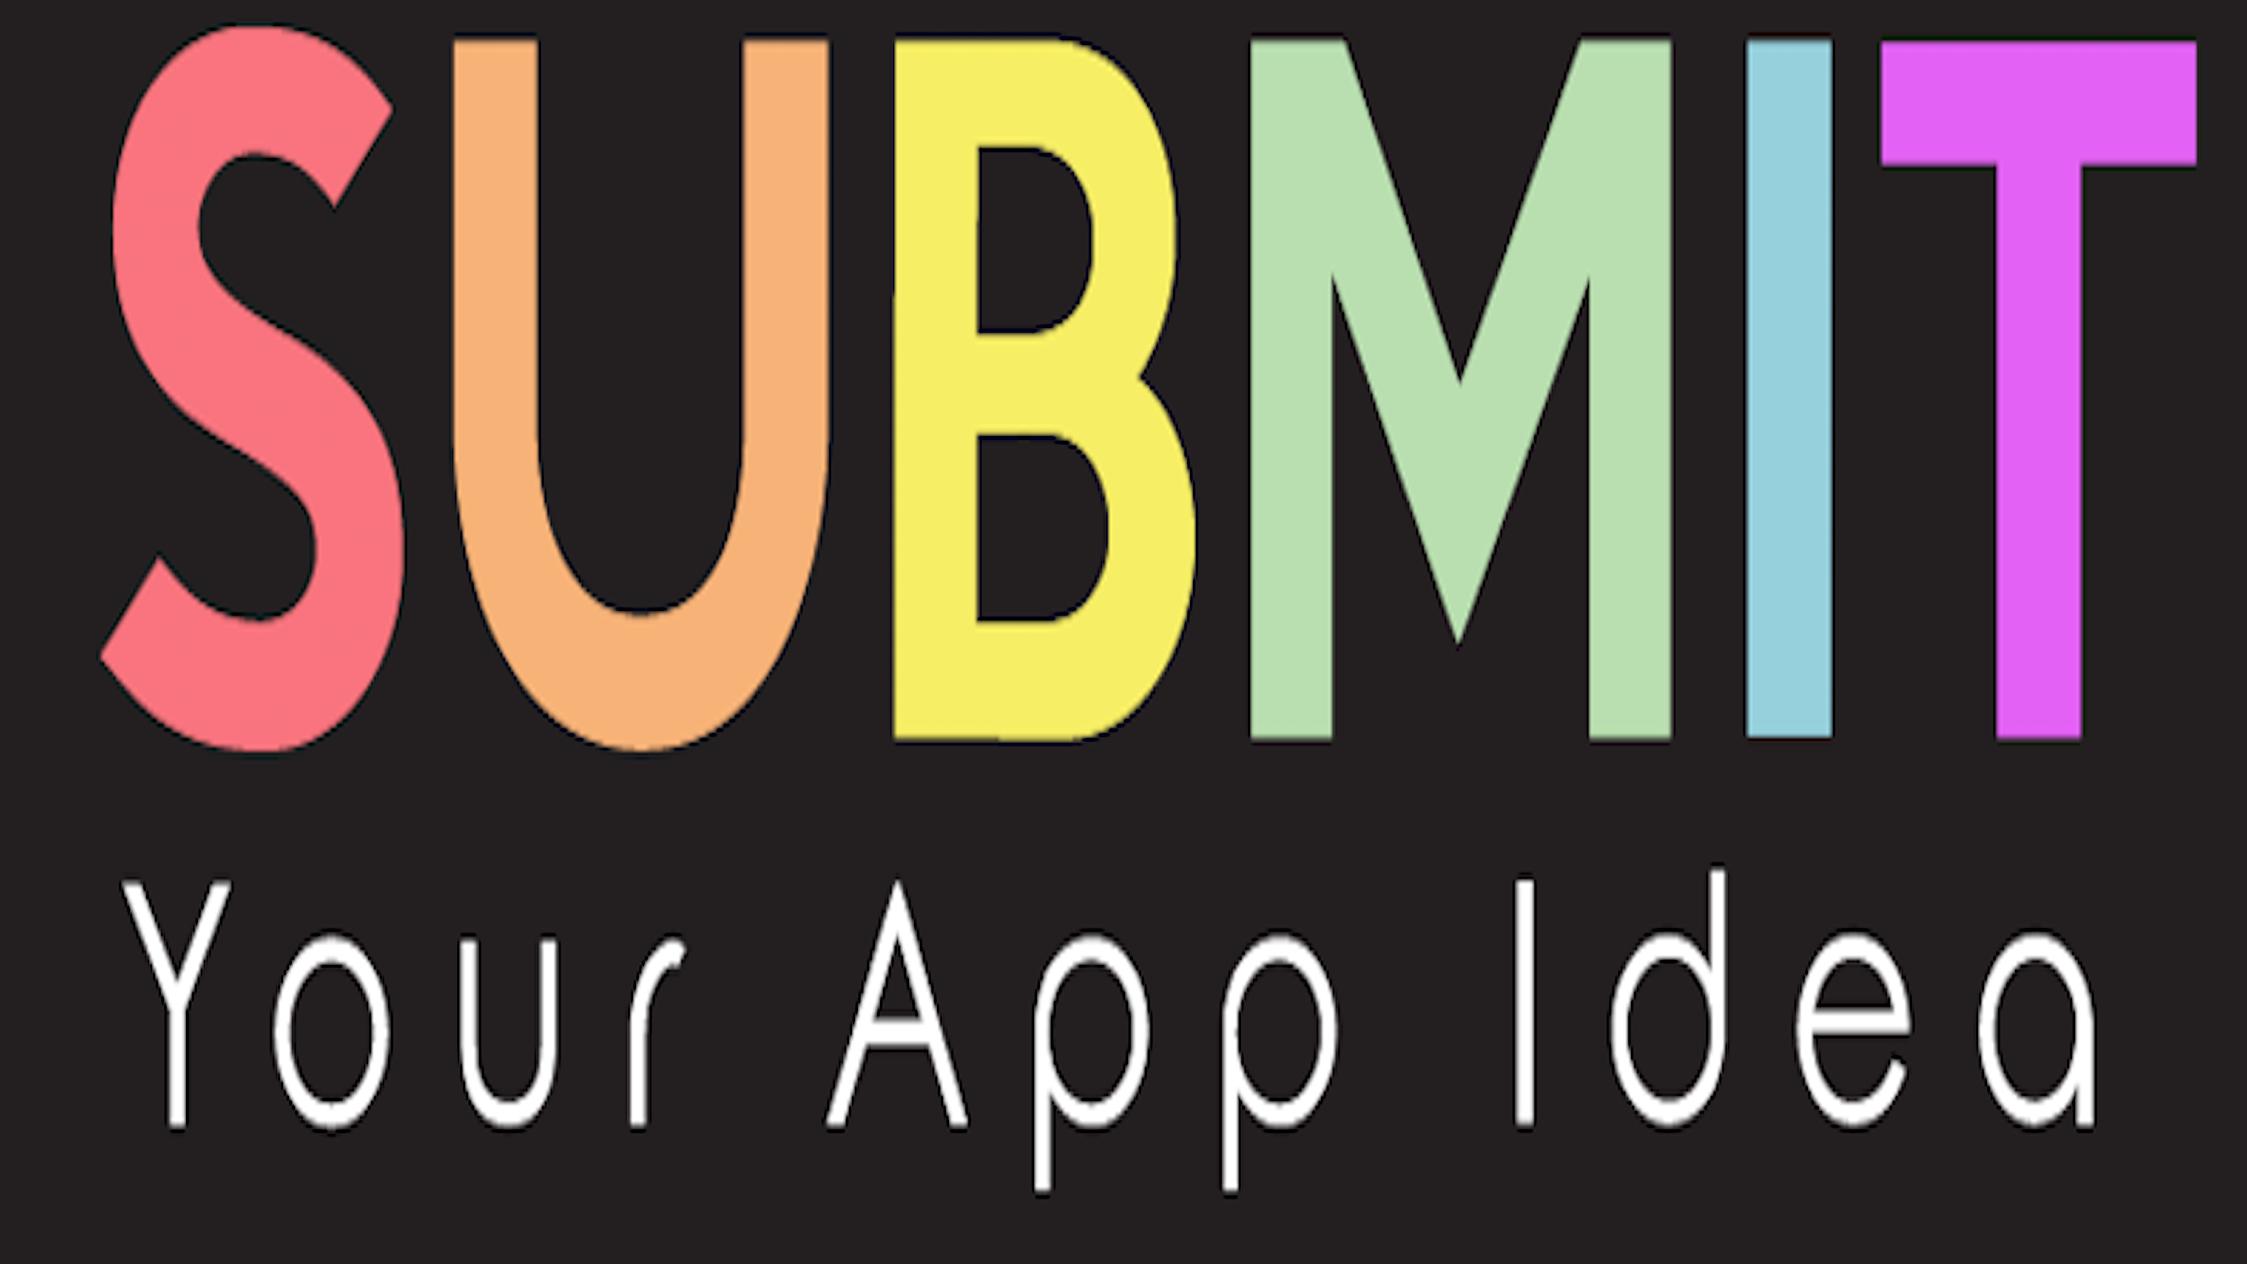 Mobile App Fund LLC